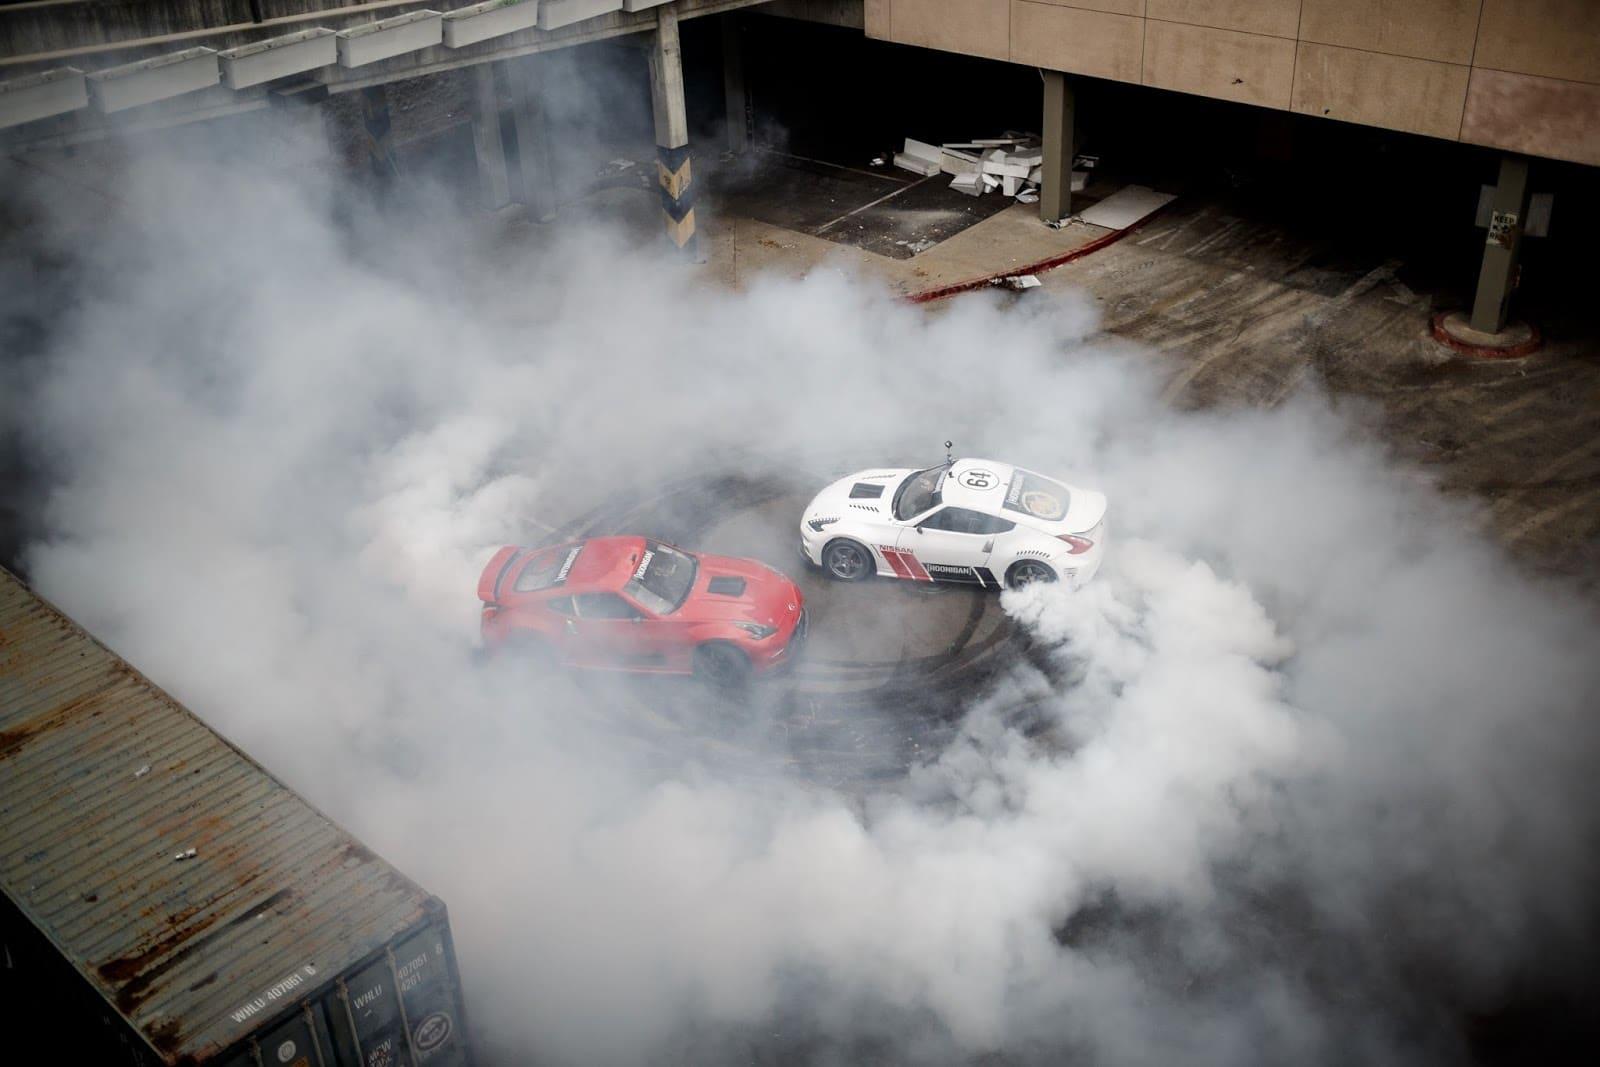 LOU 0277 Δες 2 Nissan 370Z 1000 ίππων έκαστο να ντριφτάρουν χωρίς αύριο drift, Nissan, Nissan 370Z, video, videos, zblog